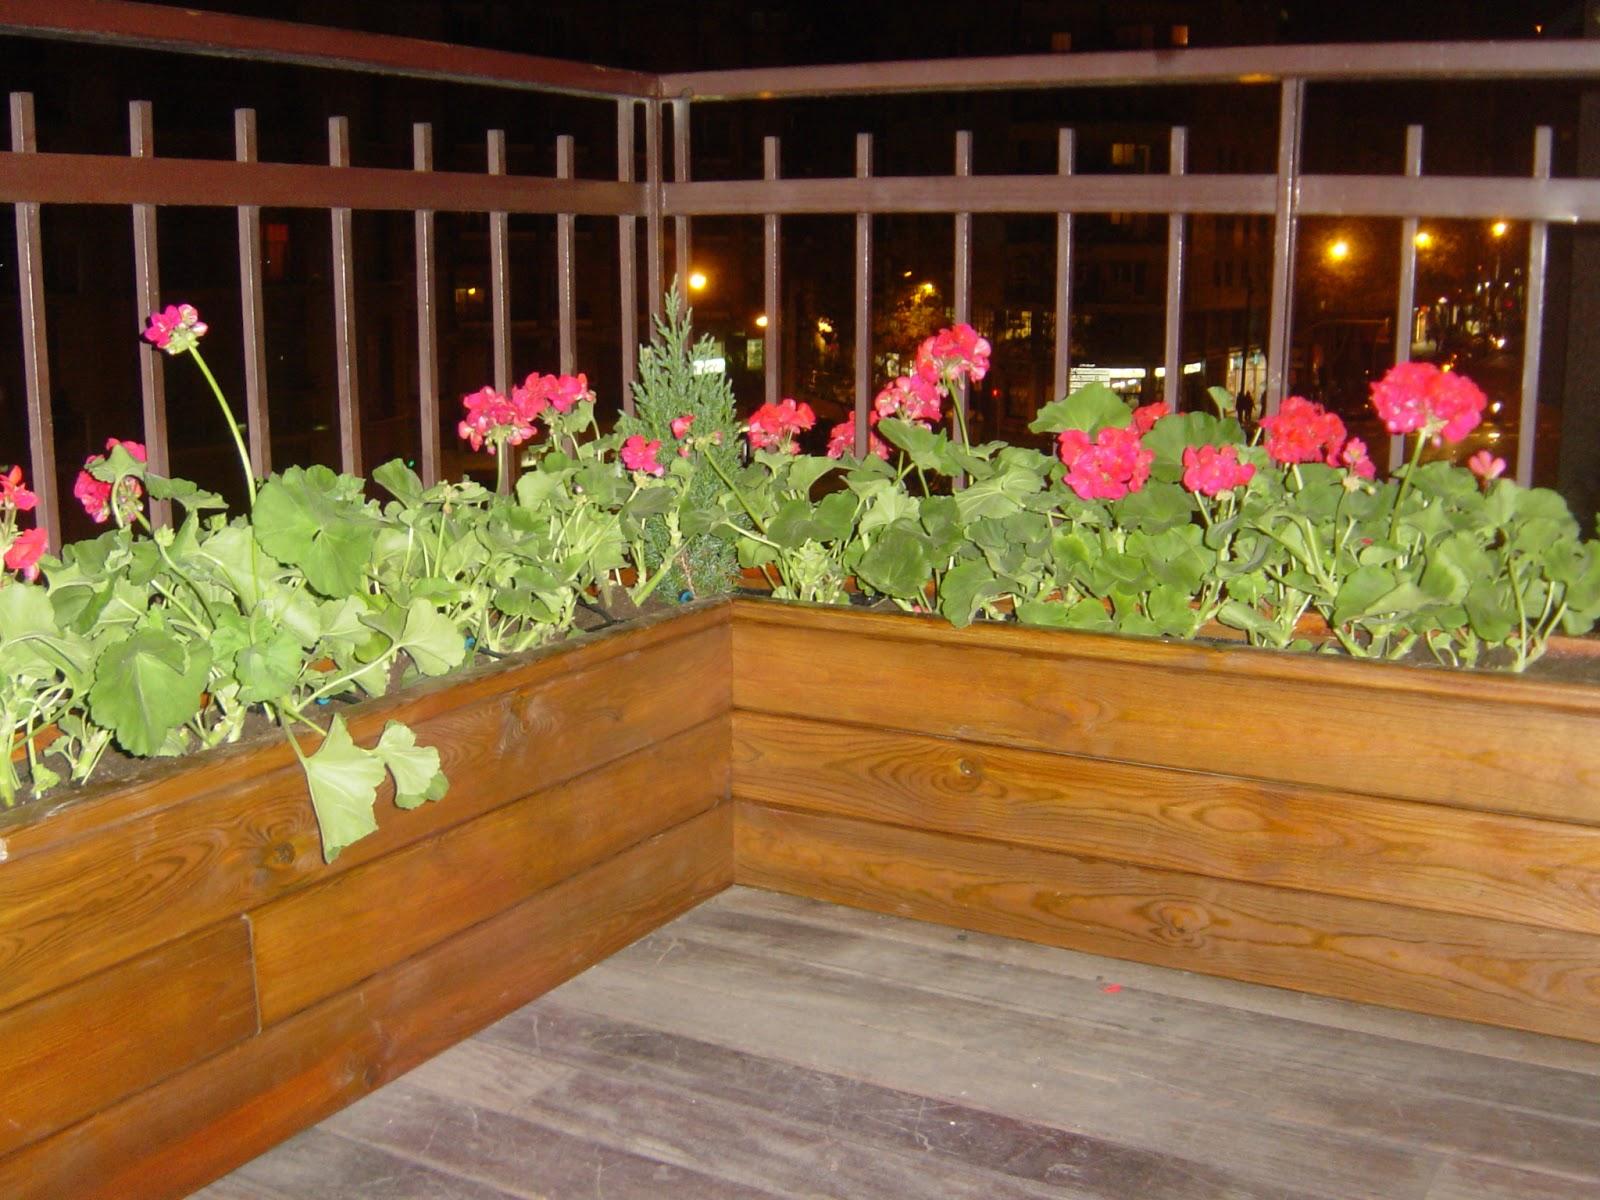 Jardineras de madera de pino a medida para terrazas - Plantas terraza ...